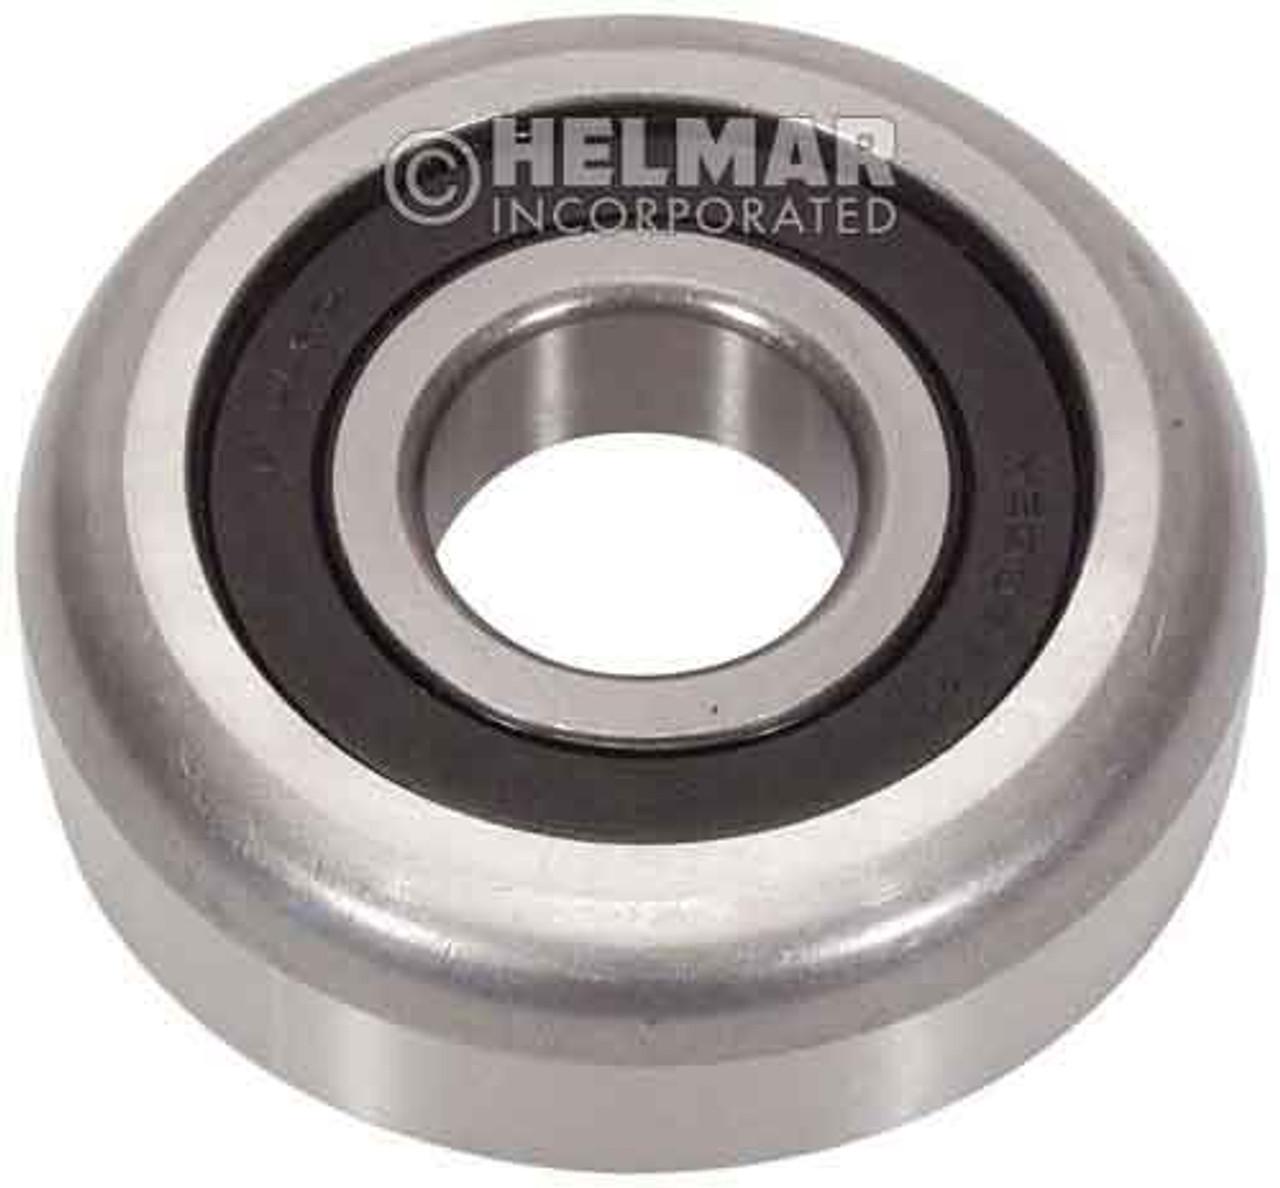 4916533 Kalmar AC Mast Roller Bearing 28.45mm Wide, 101.04mm Outer Diameter, 34.79mm Inner Diameter